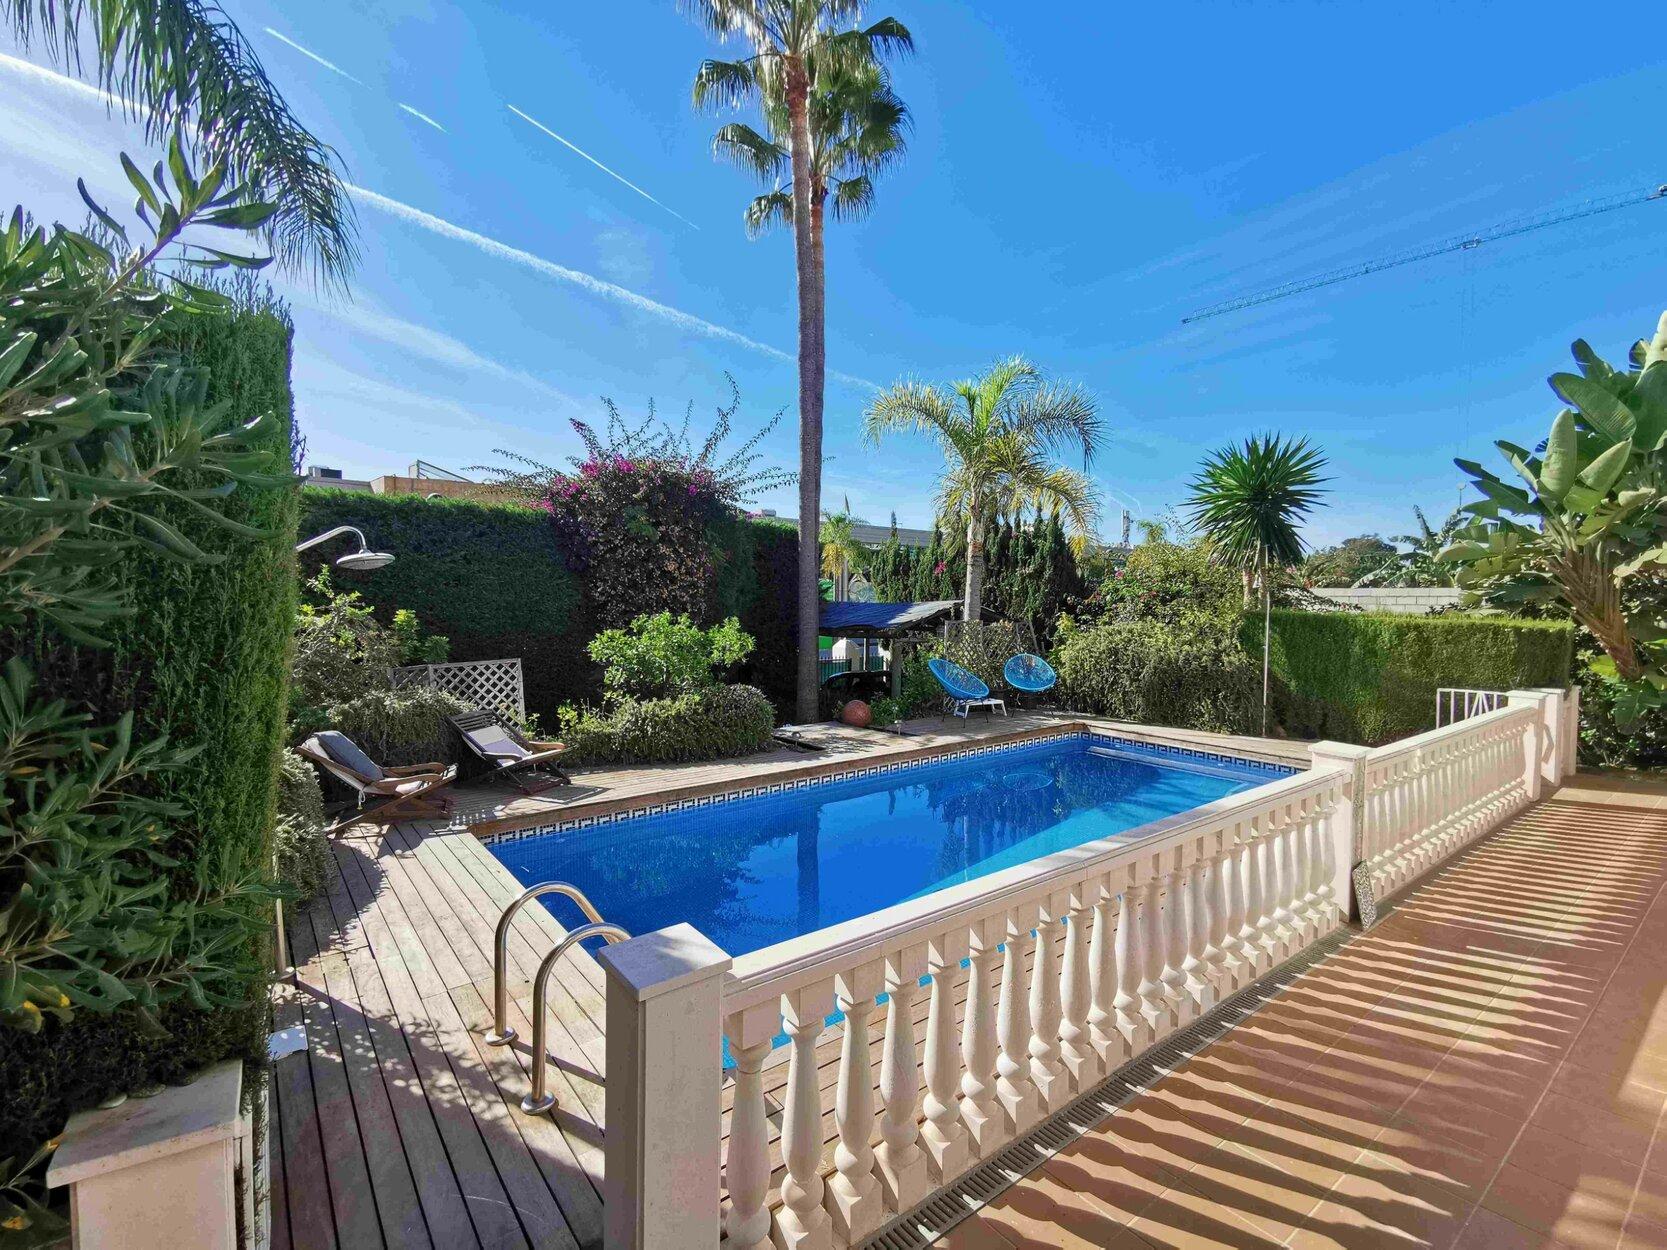 Townhouse for rent in Marbella, Villa Parra Palomera